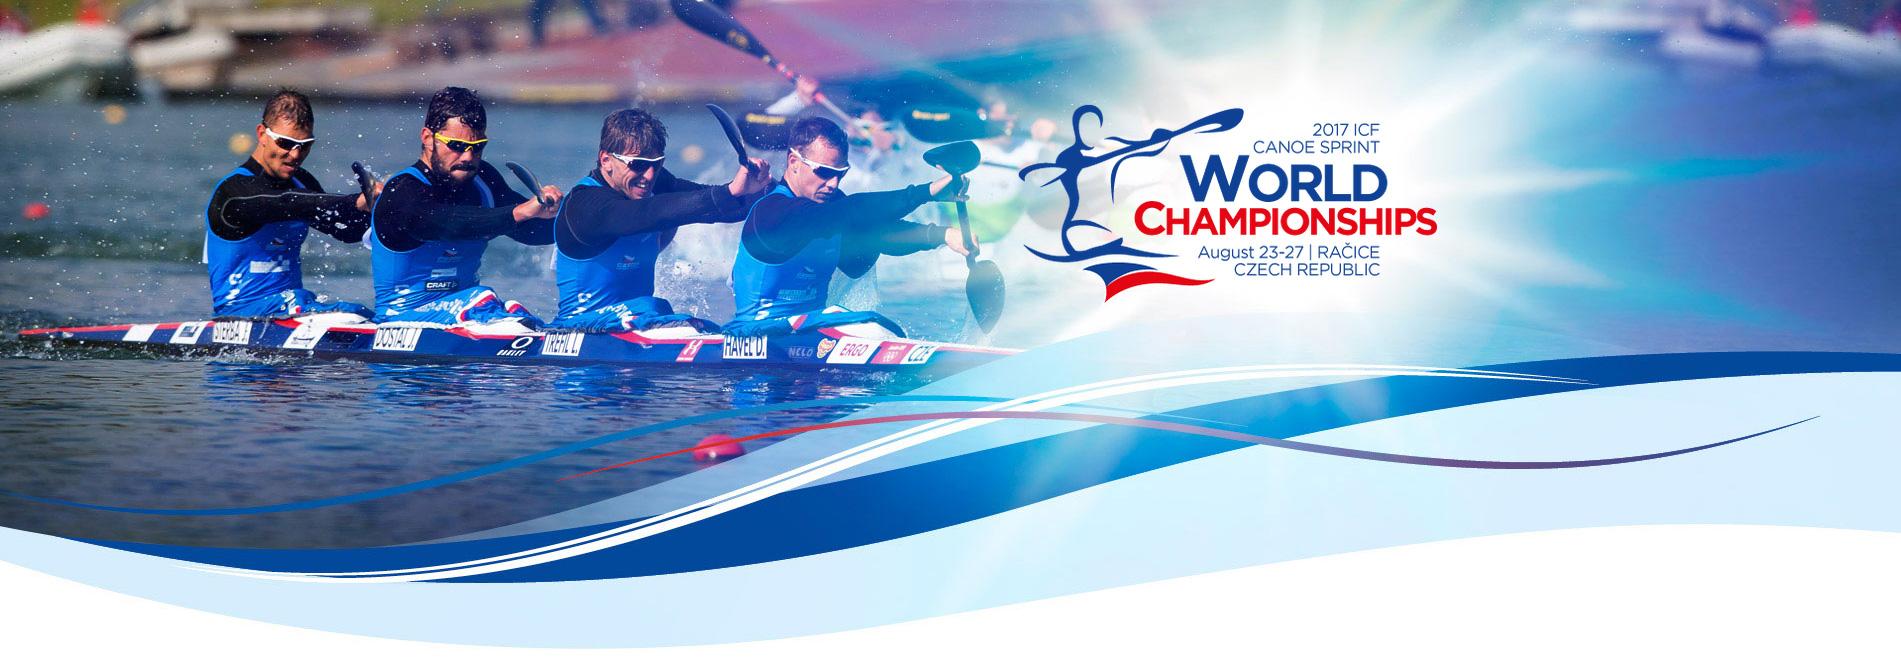 CF Canoe Sprint World Championships Racice 2017